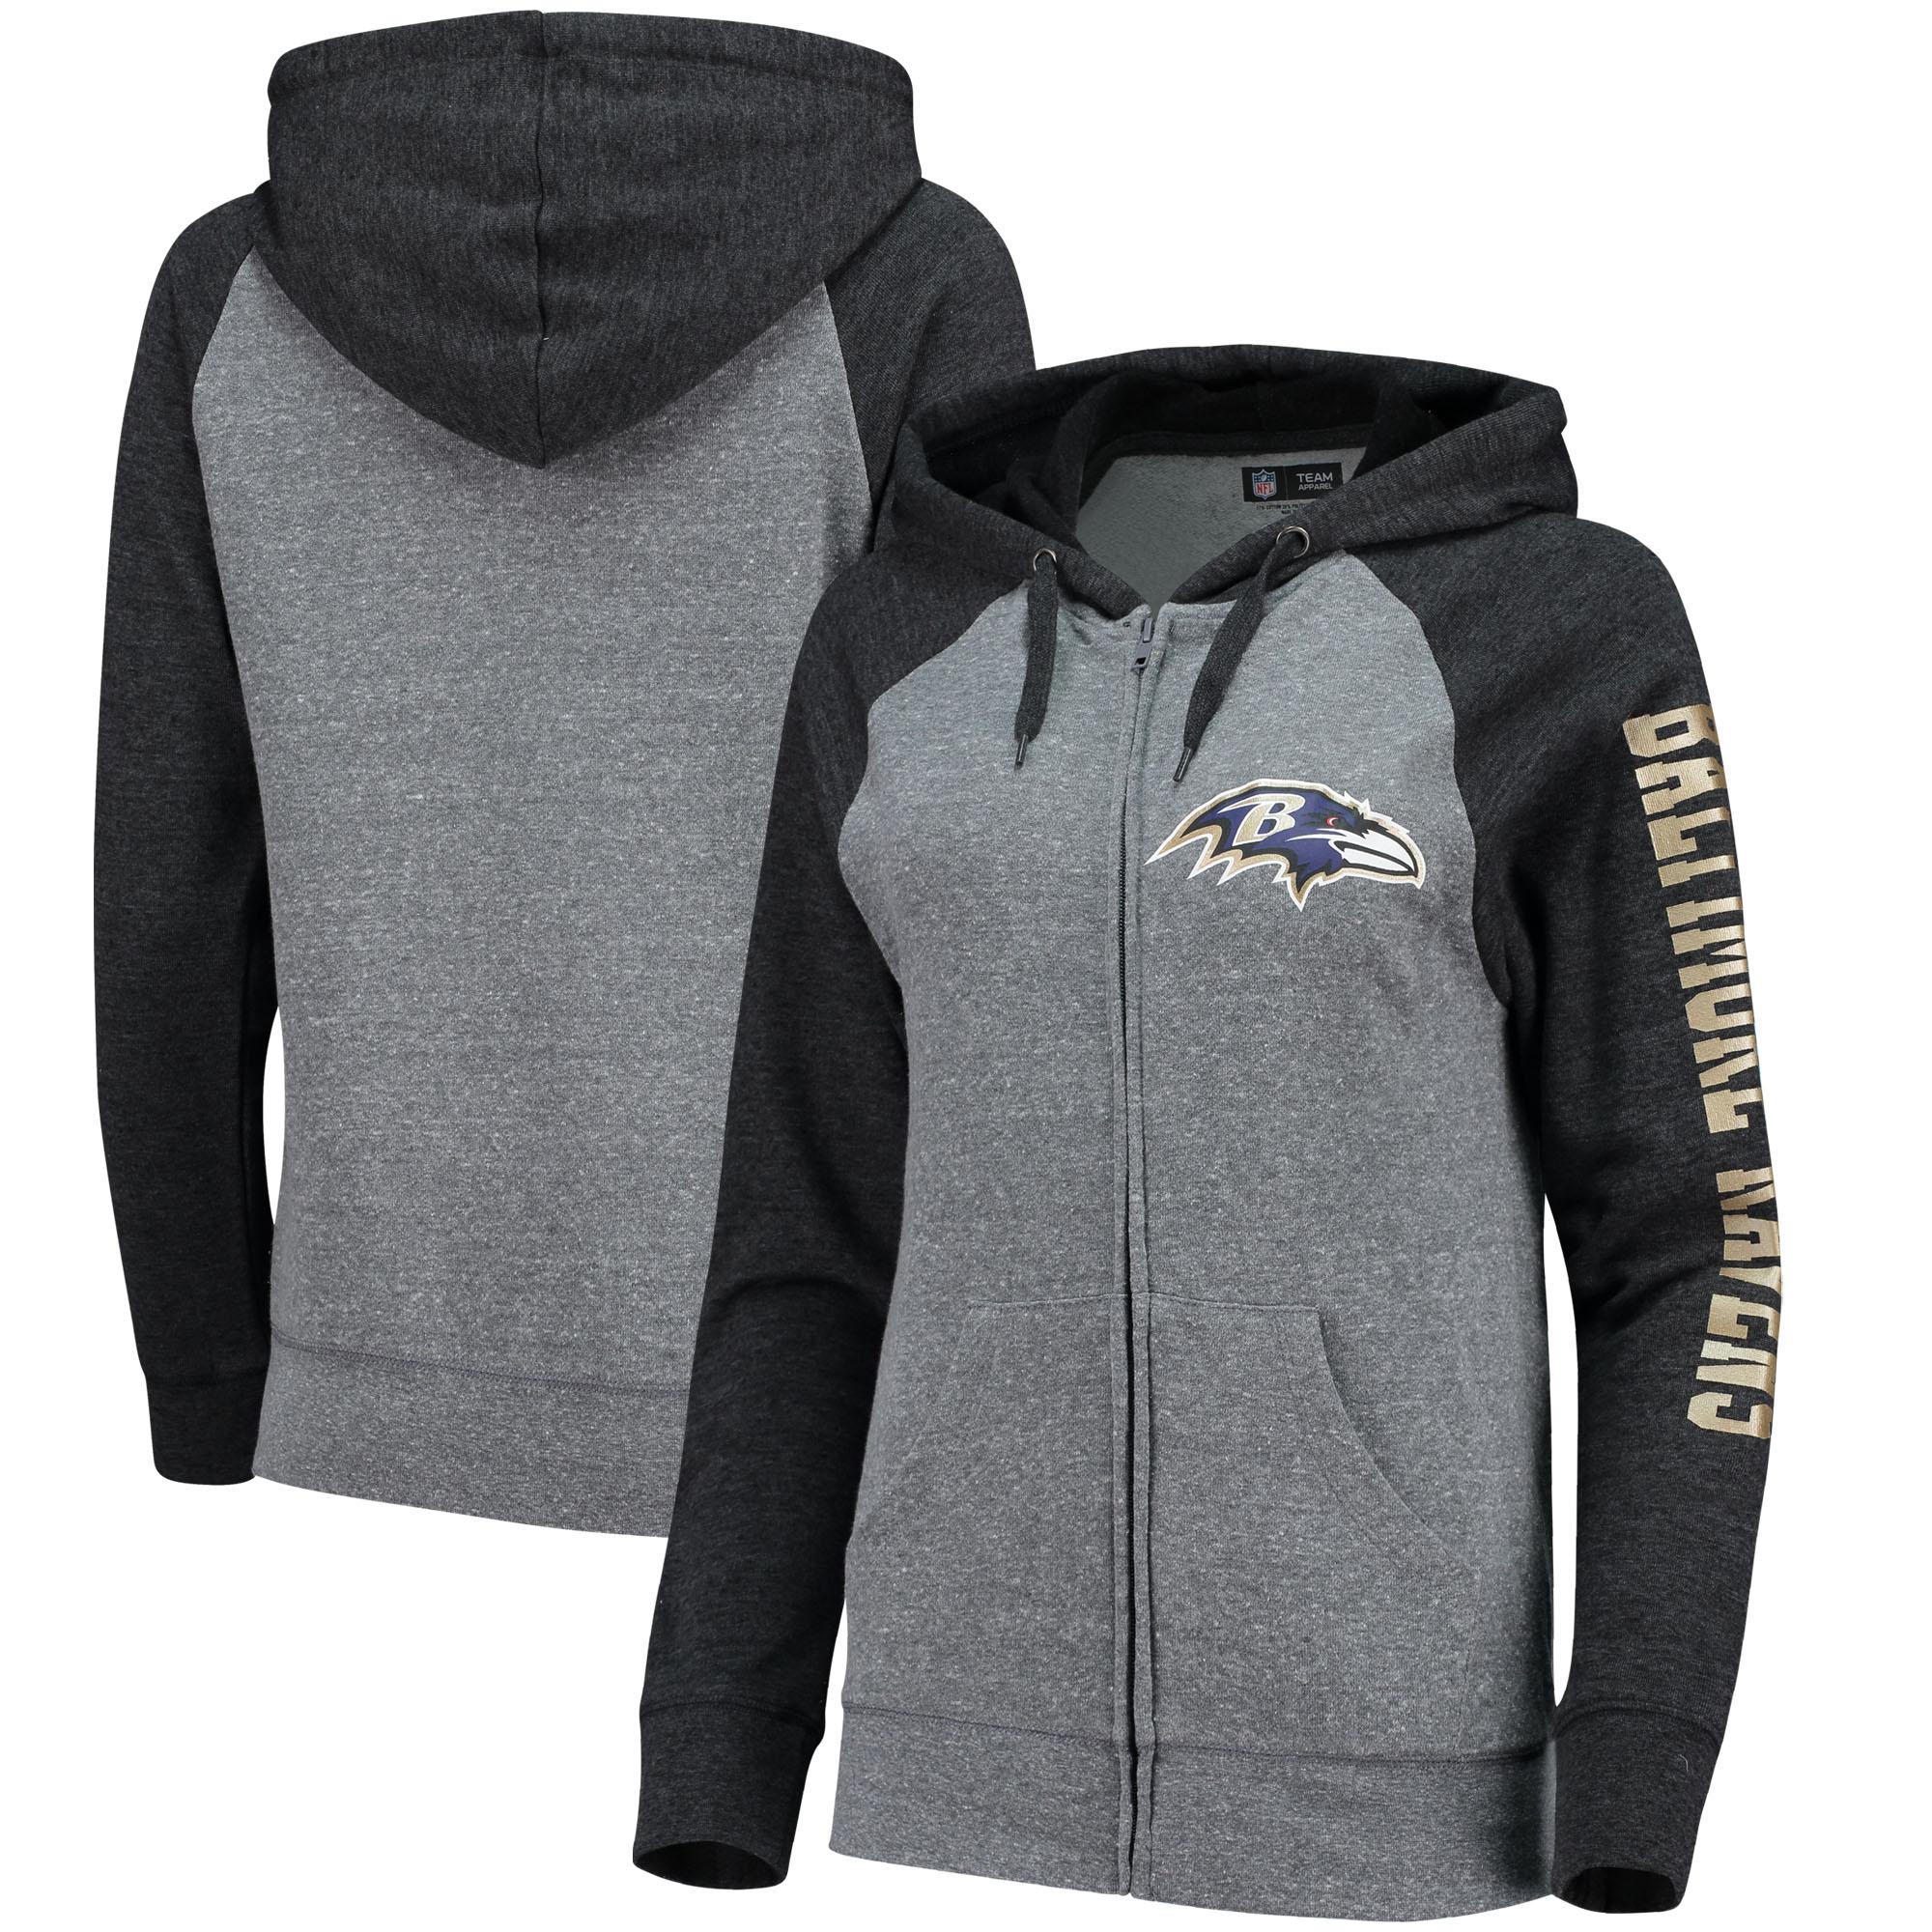 Baltimore Ravens 5th & Ocean by New Era Women's Fleece Tri-Blend Raglan Sleeve Full-Zip Hoodie - Heathered Gray/Black